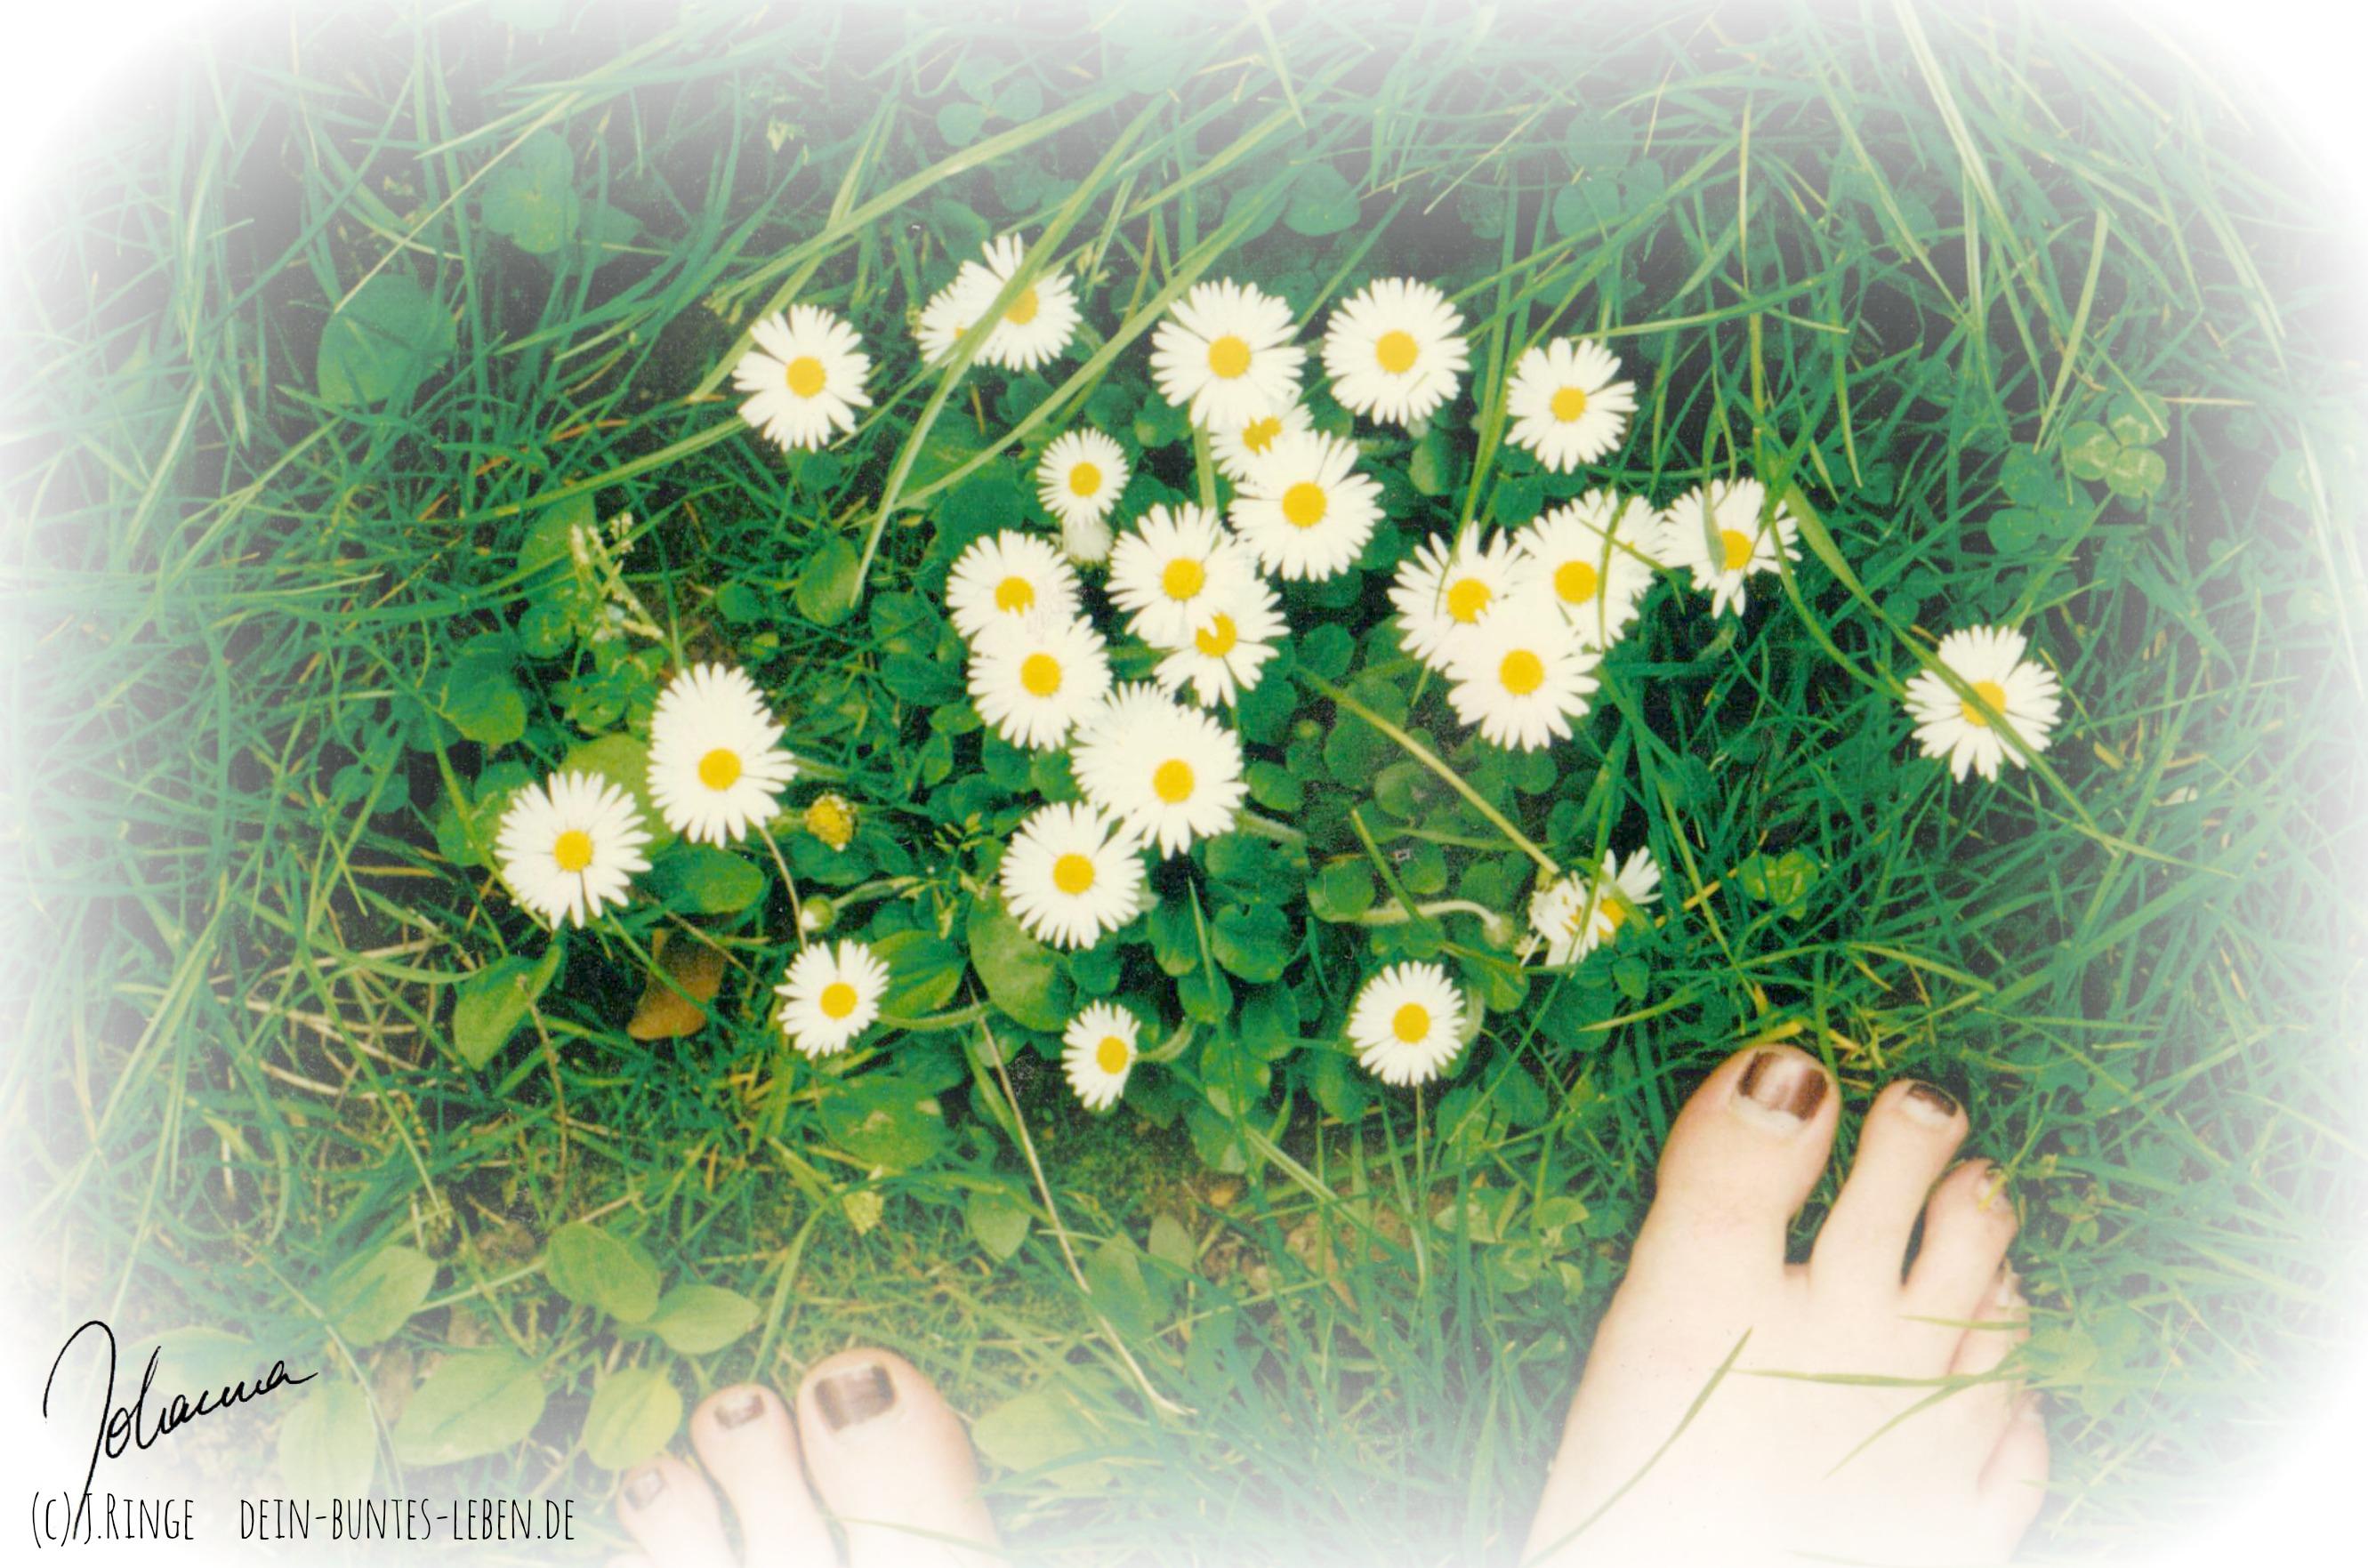 Gras Wachstum (c) Johanna Ringe